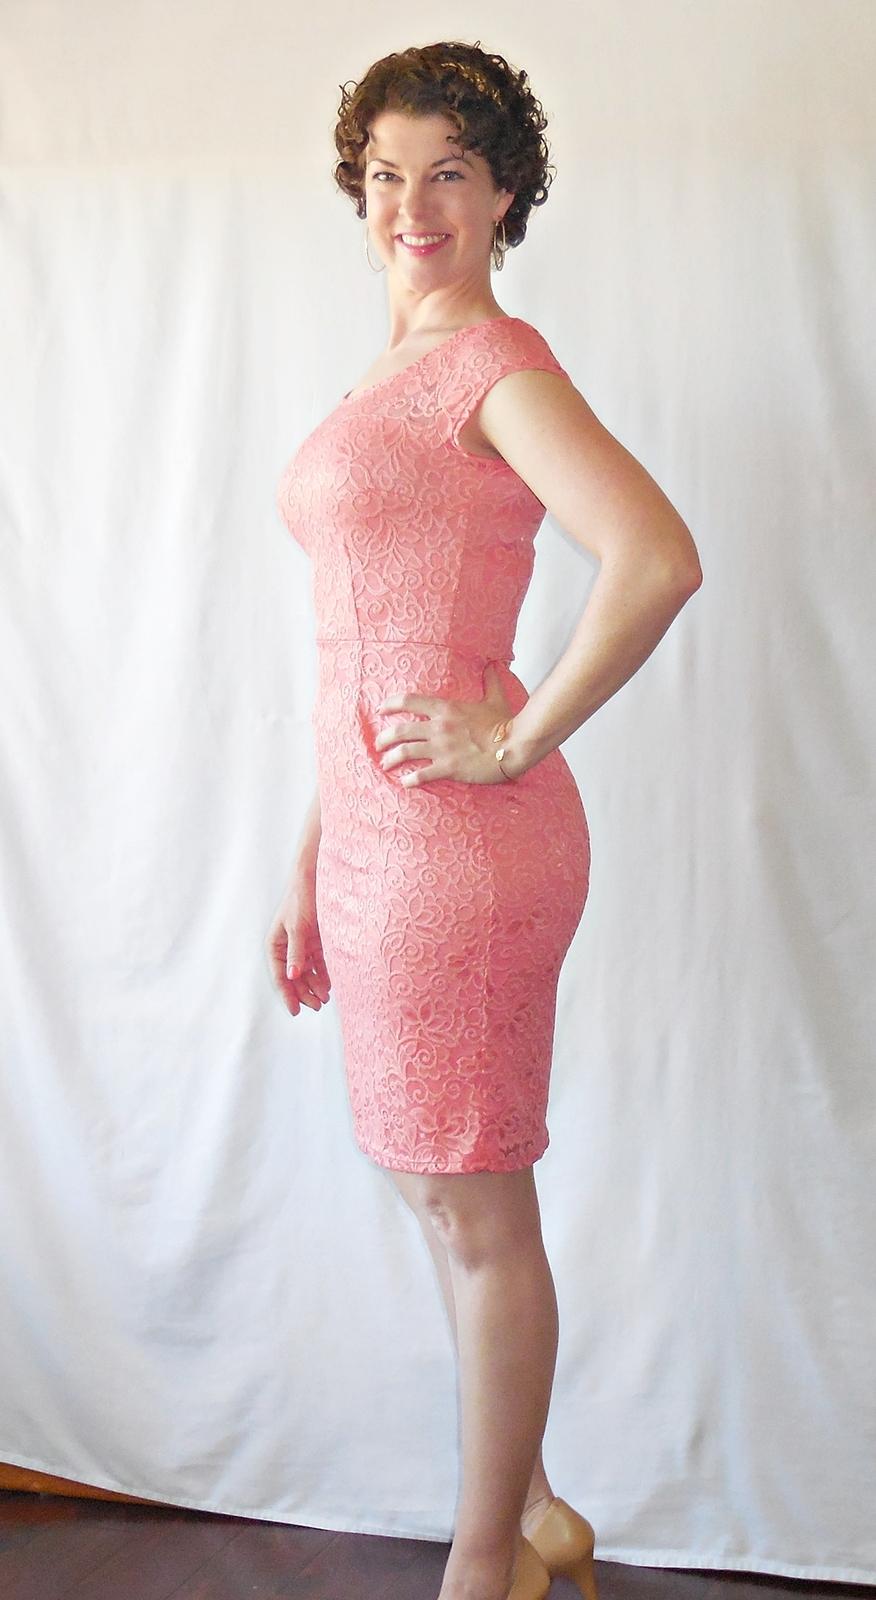 e367d43aac6 Peach Lace Bodycon Dress with Pencil Skirt